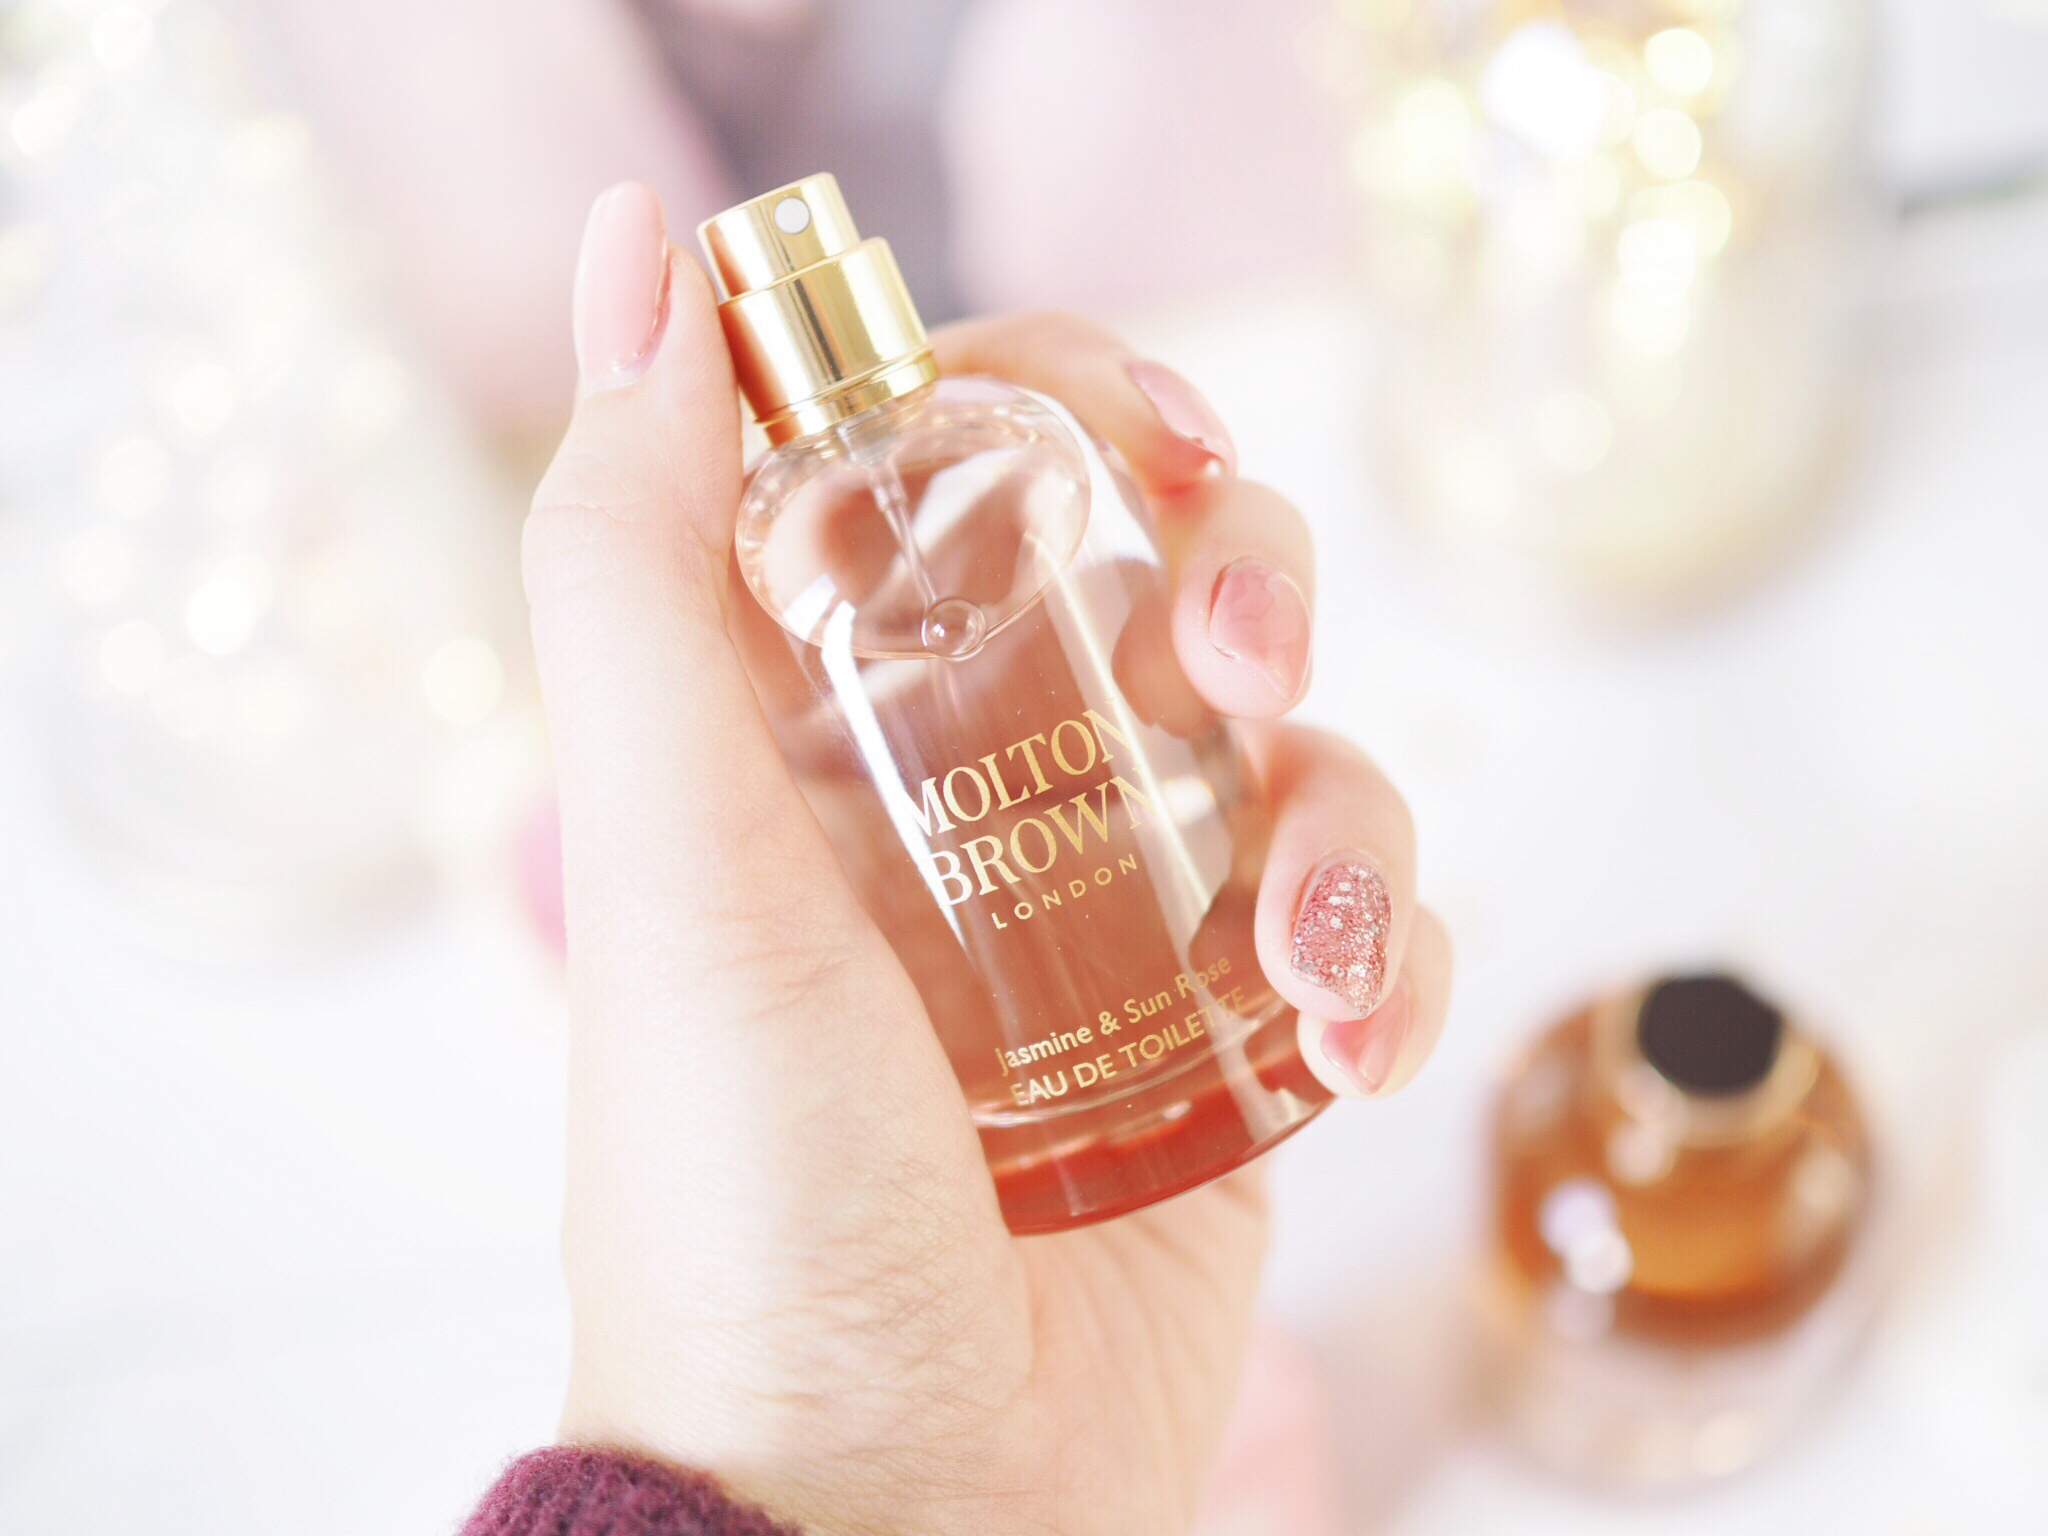 Meet The New Molton Brown Fragrance Jasmine & Sun Rose